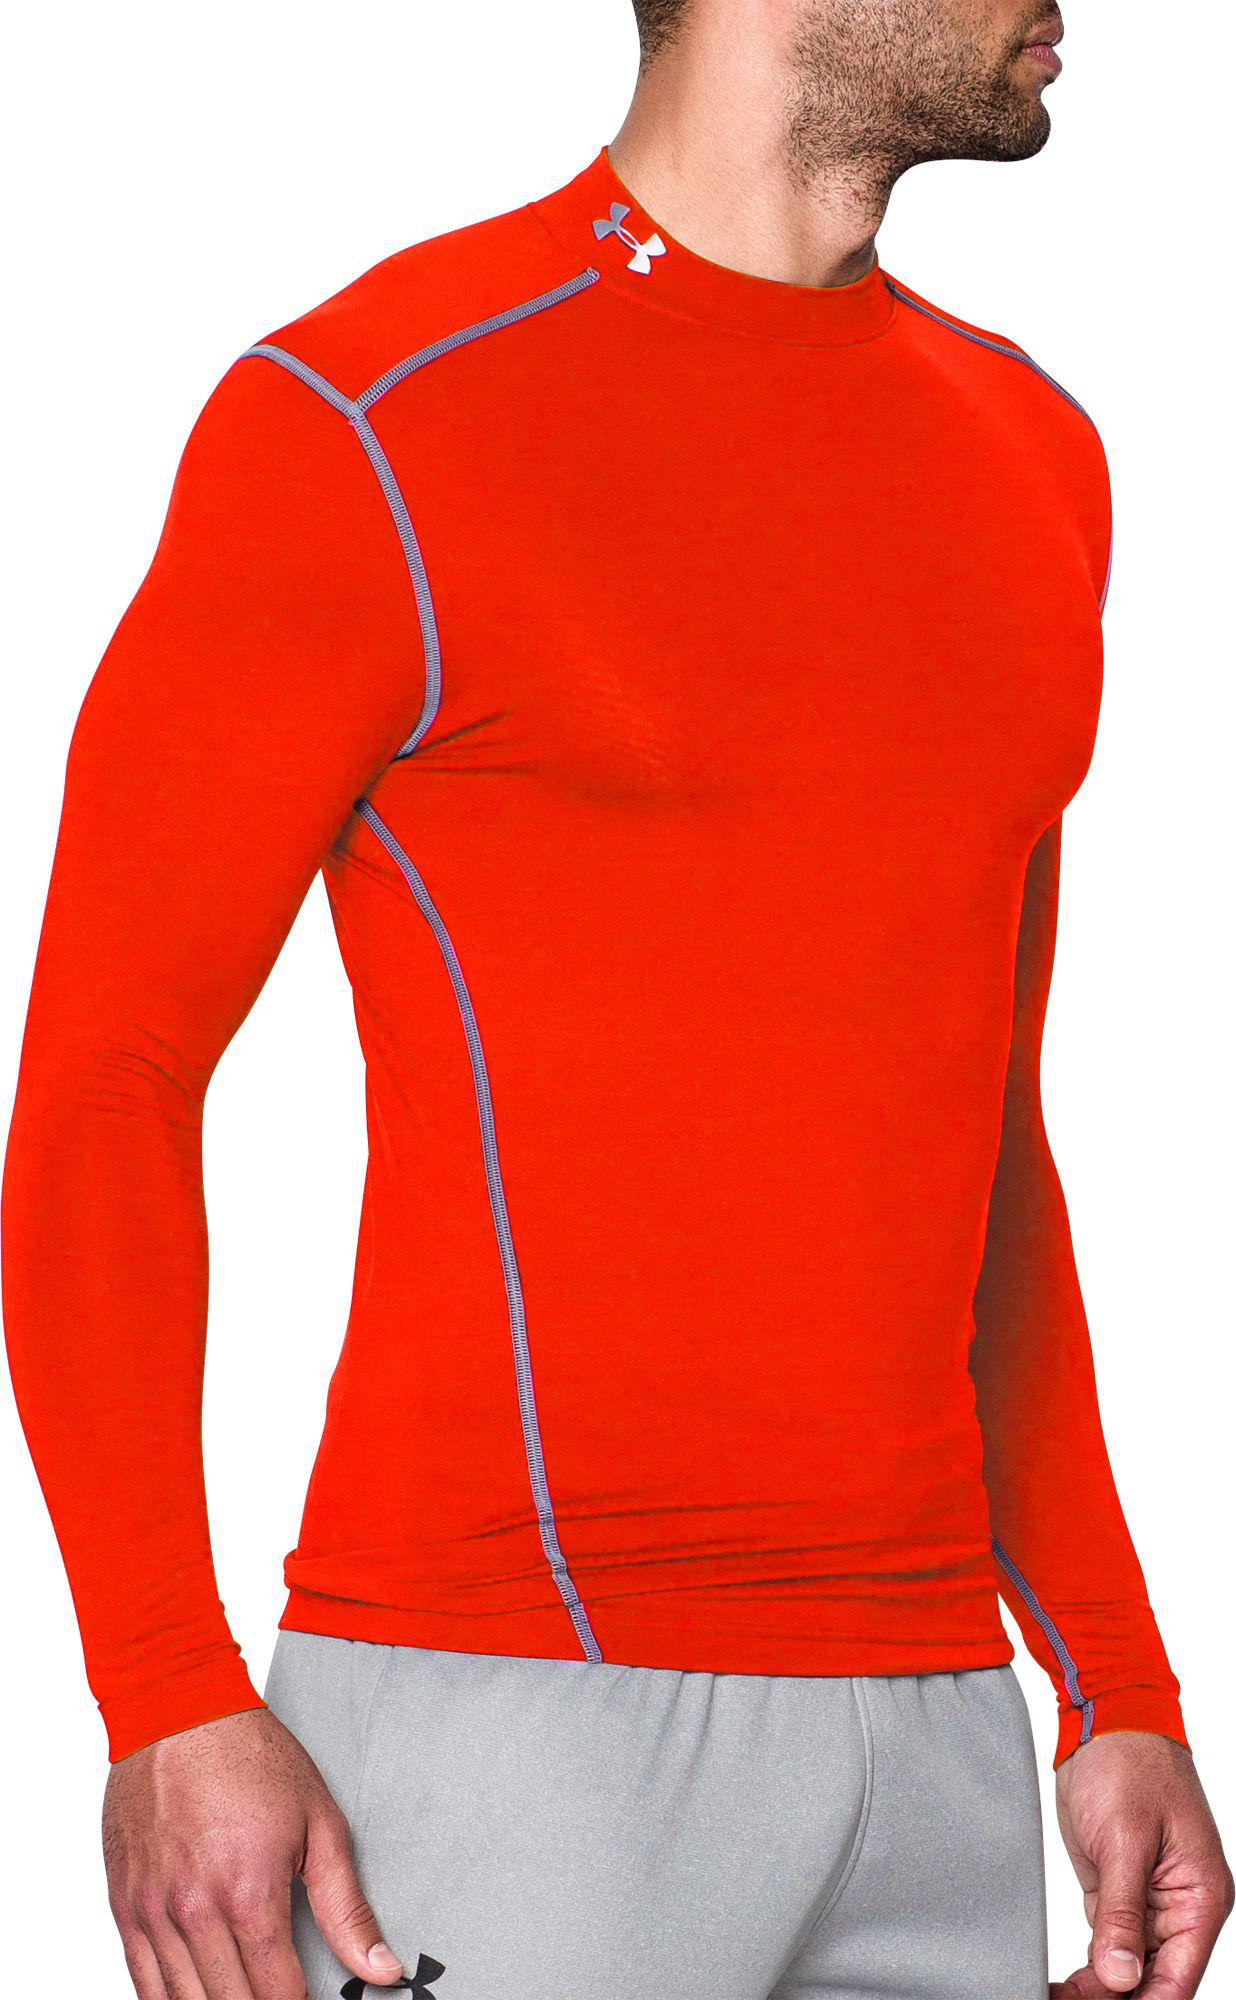 c6a7428d0 Under Armour - Orange Coldgear Armour Compression Mock Neck Long Sleeve  Shirt for Men - Lyst